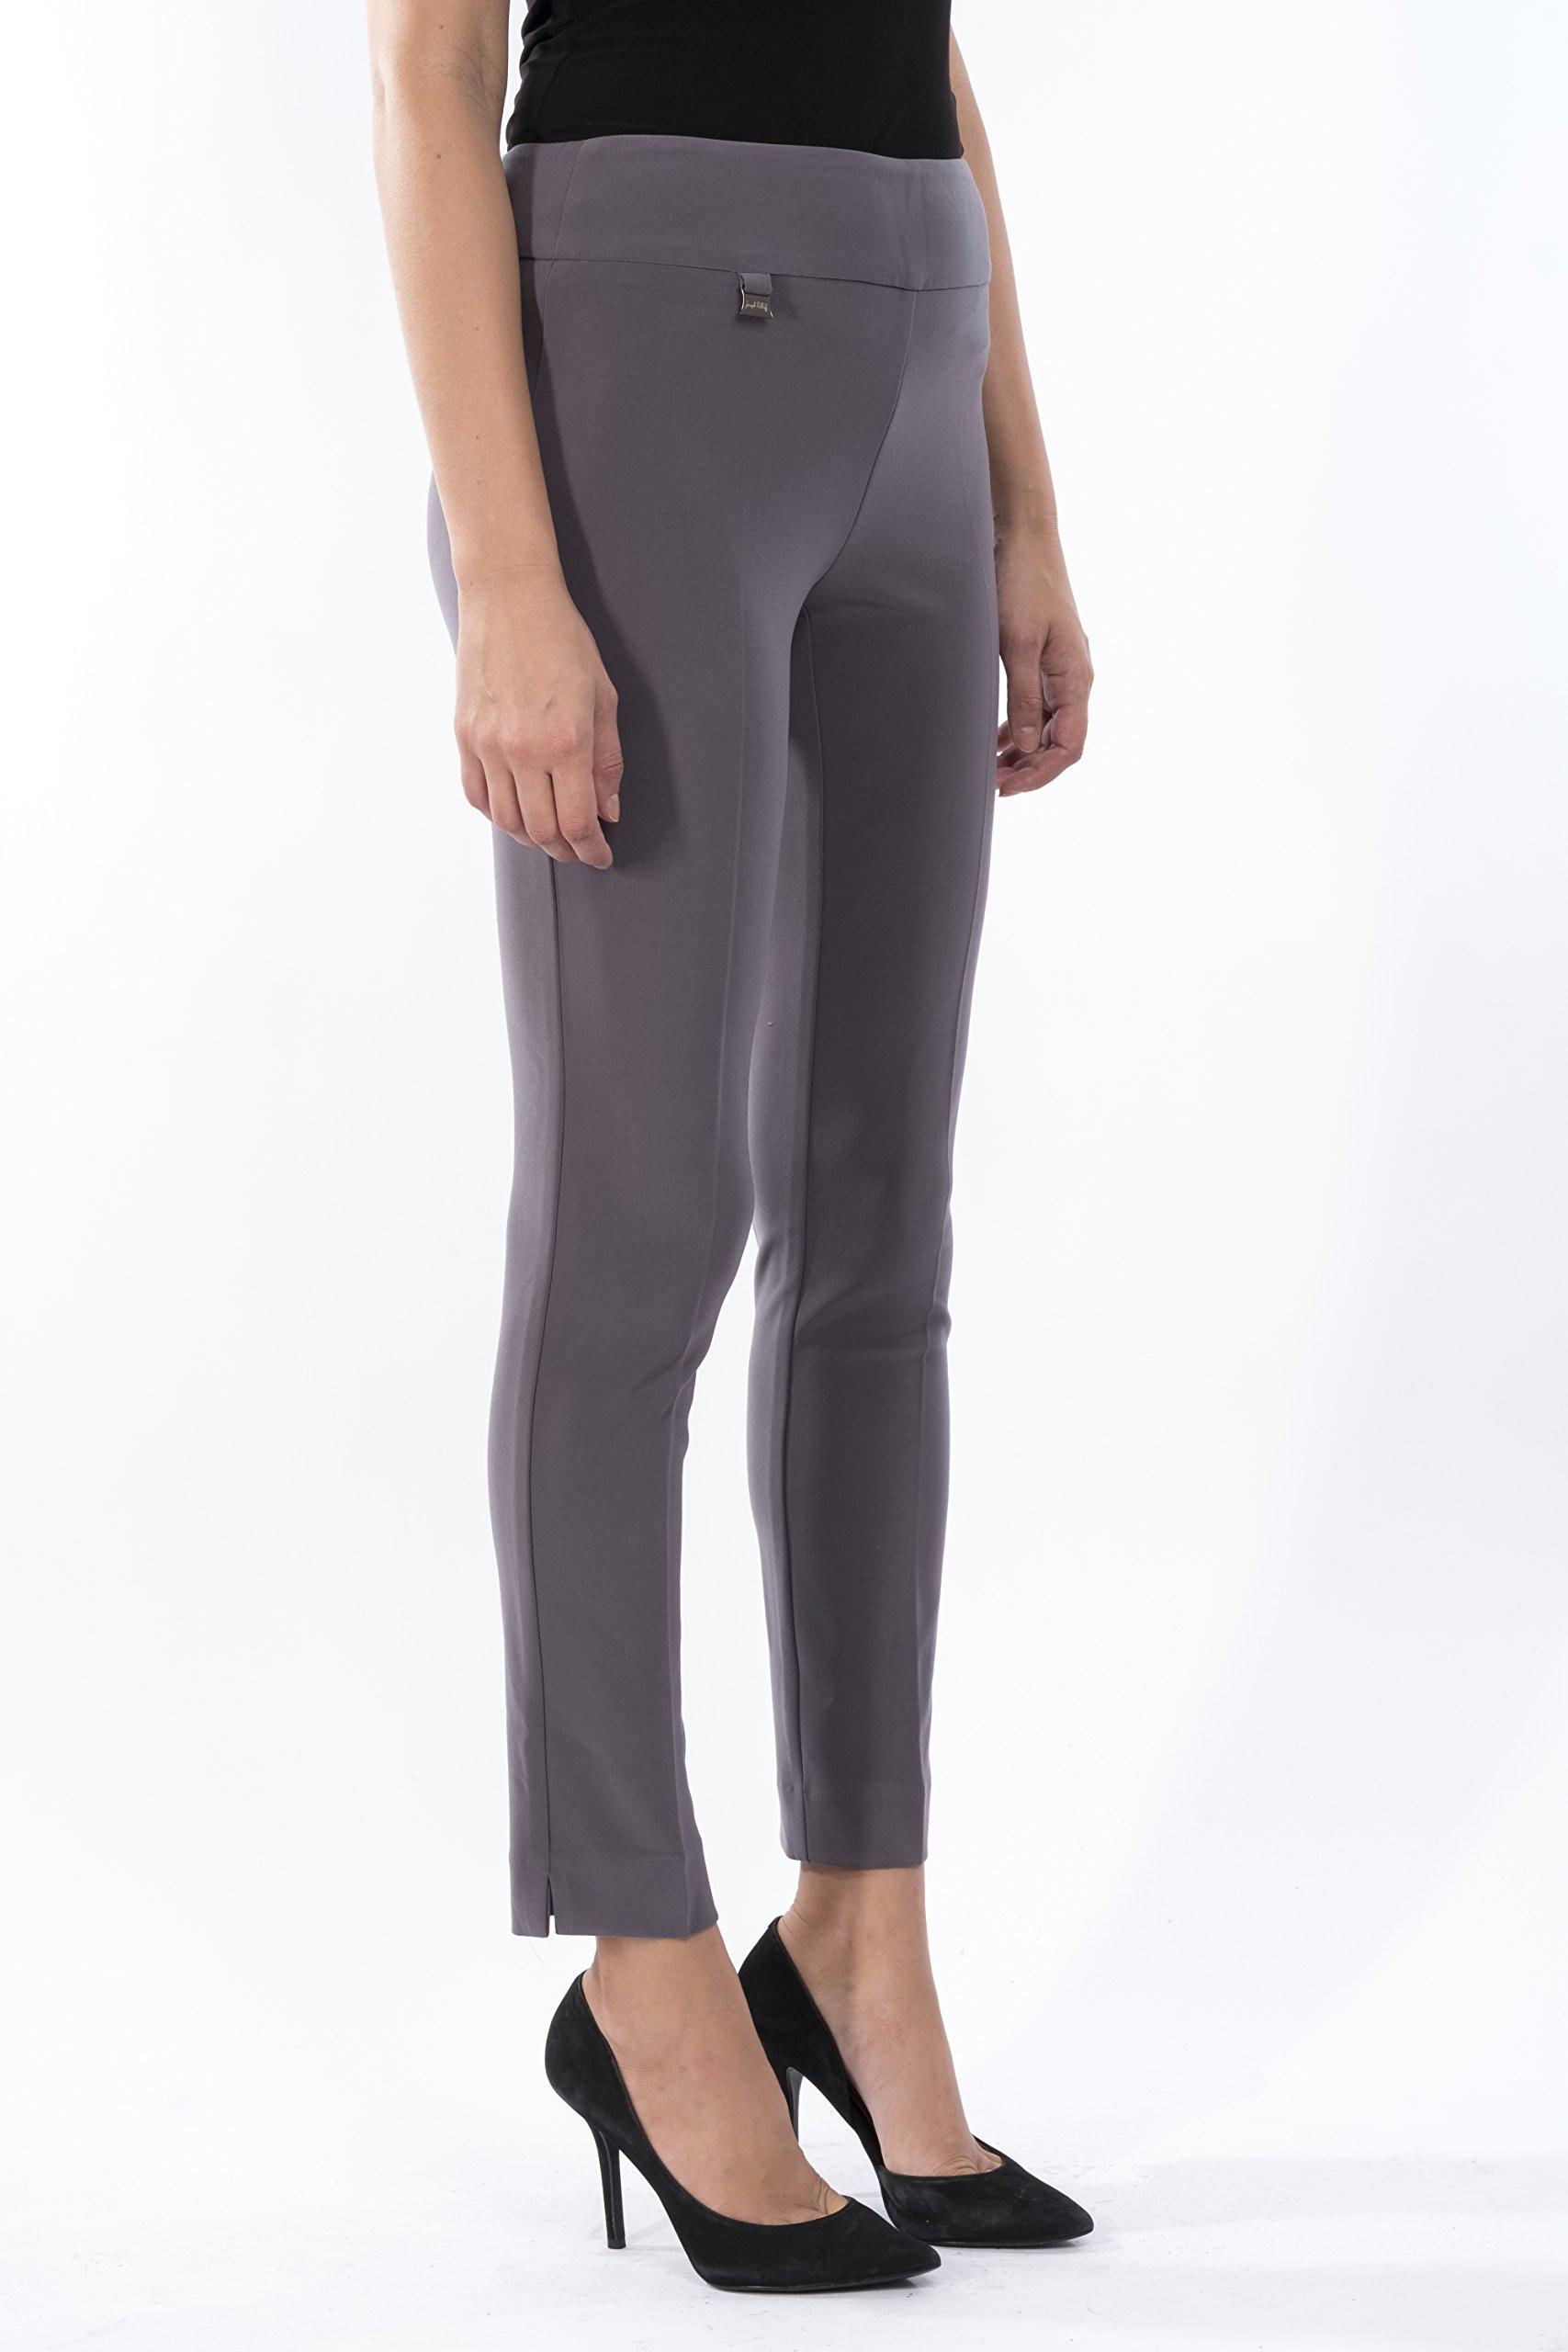 Joseph Ribkoff Ankle Length Wide Waistband Tailored Pant Zipperless - Style 144092 - Size 18 by Joseph Ribkoff (Image #2)